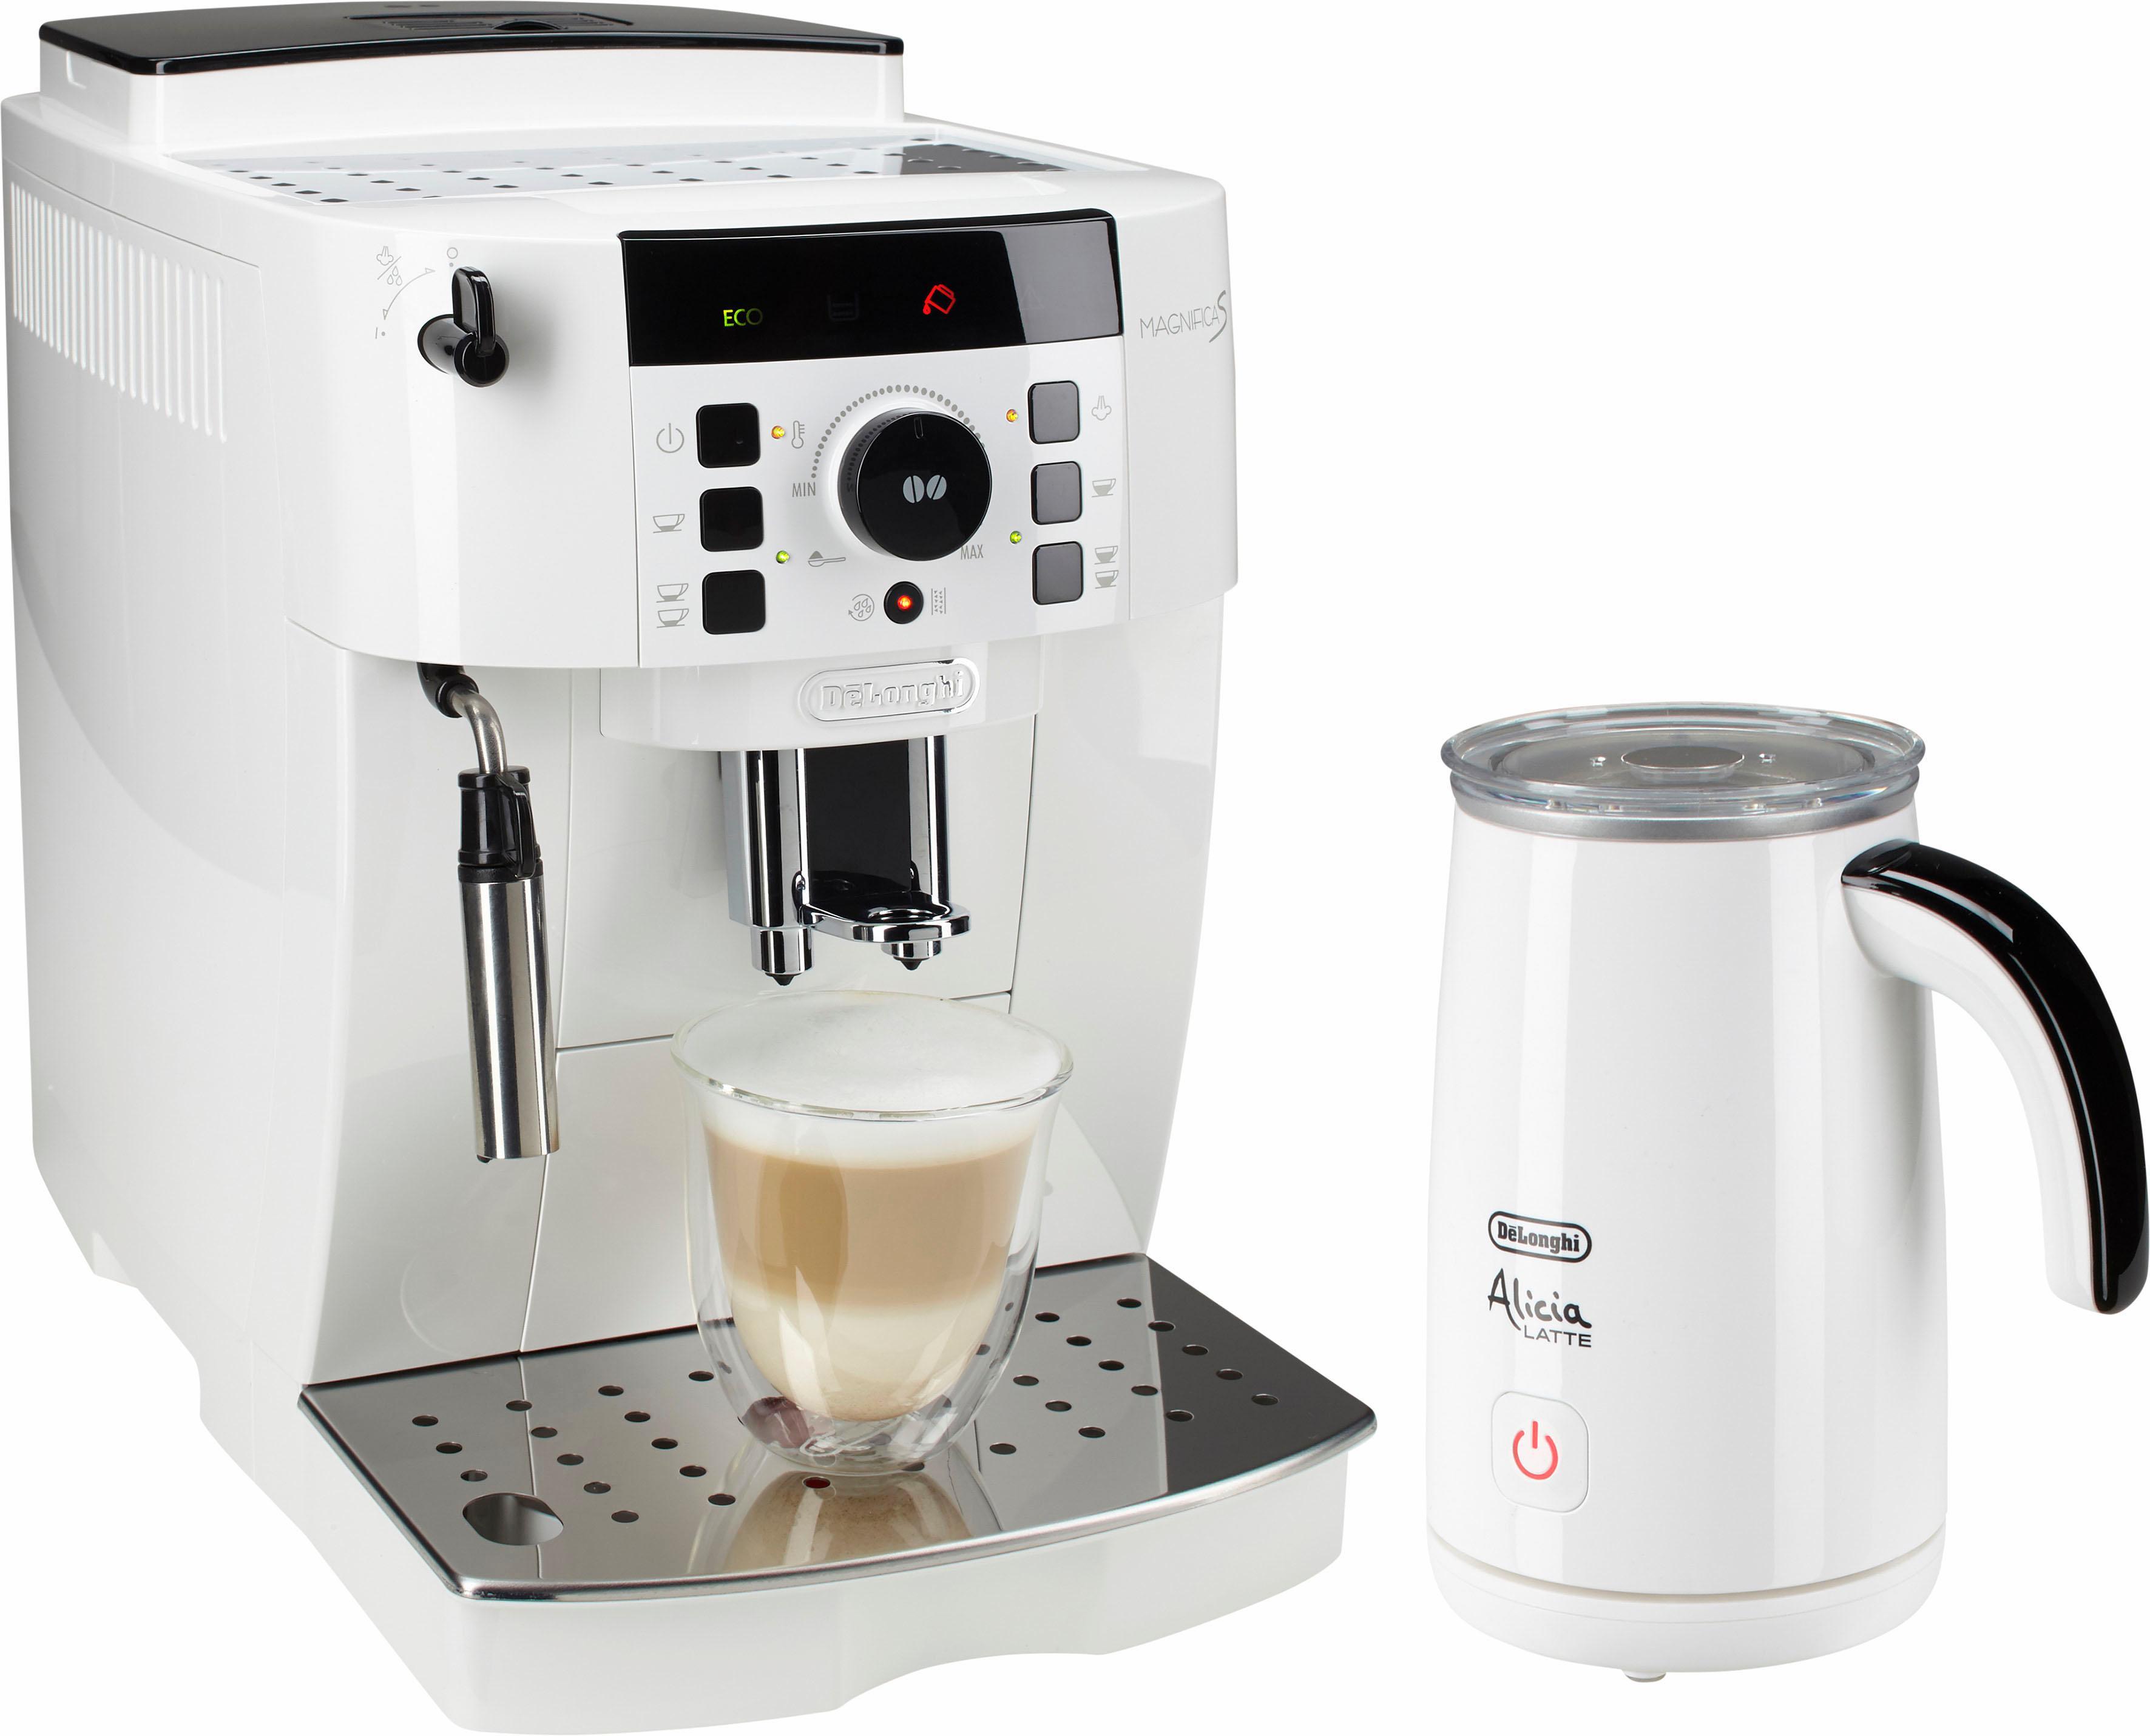 De´Longhi Kaffeevollautomat ECAM 21.118.W, 1,8l Tank, Kegelmahlwerk | Küche und Esszimmer > Kaffee und Tee > Kaffeevollautomaten | Weiß | DELONGHI